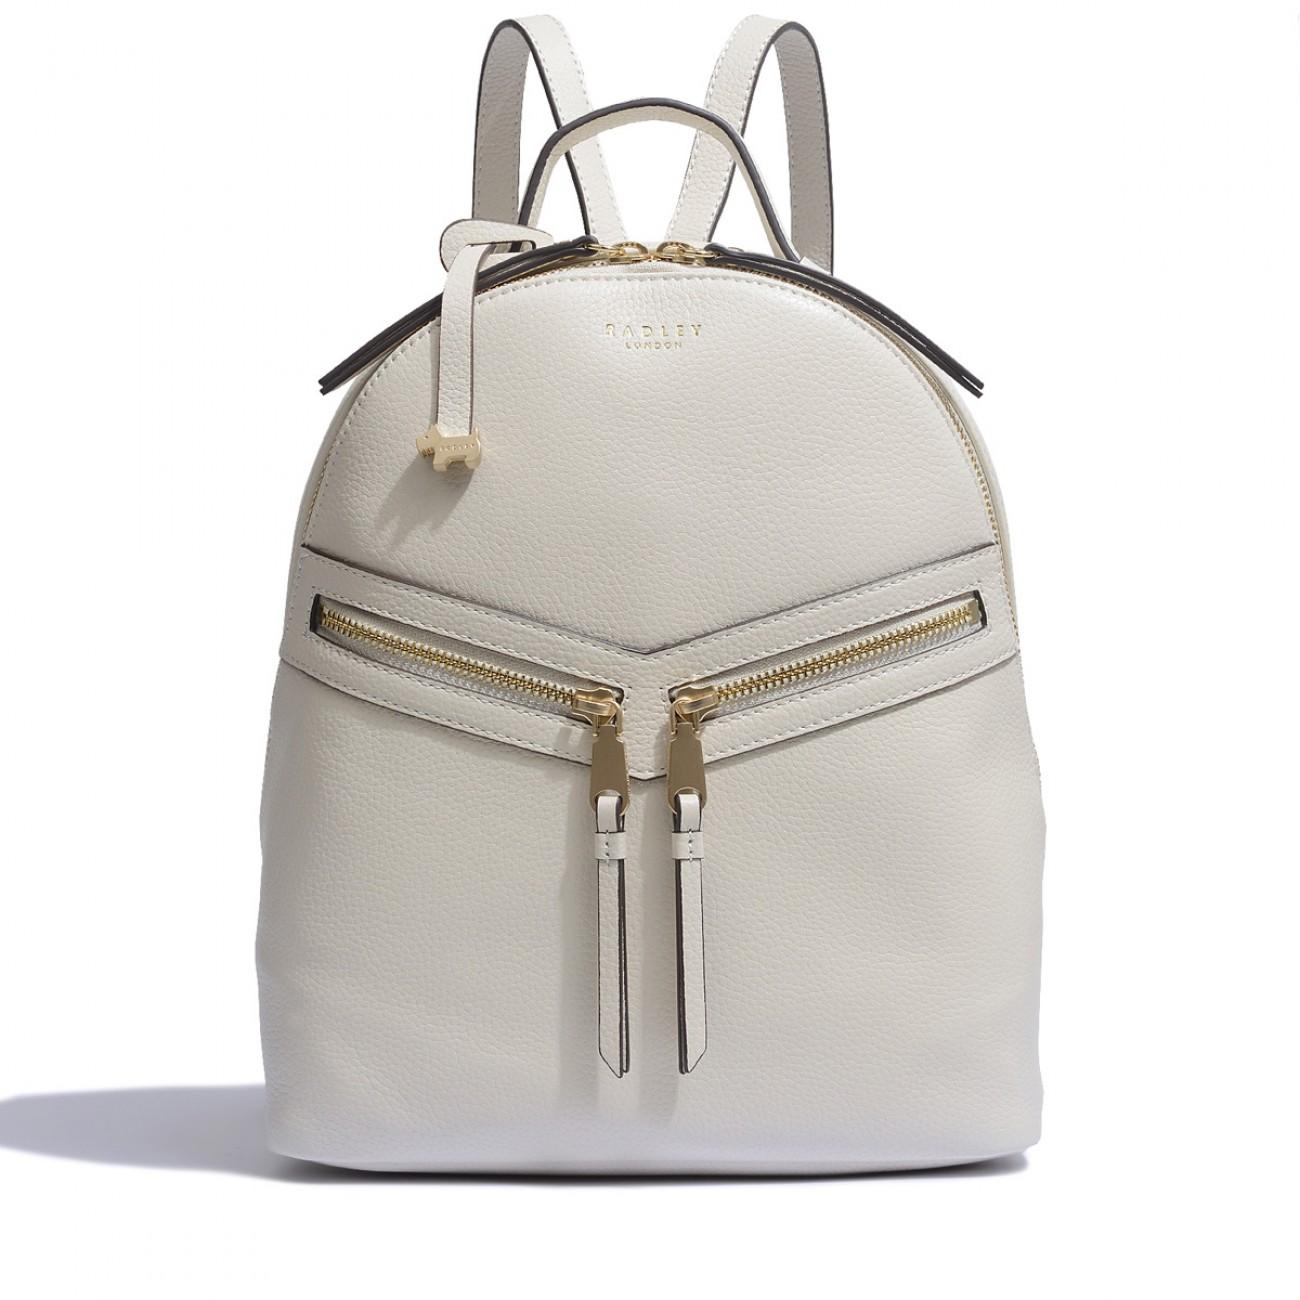 Smith Street Medium Zip Around Backpack